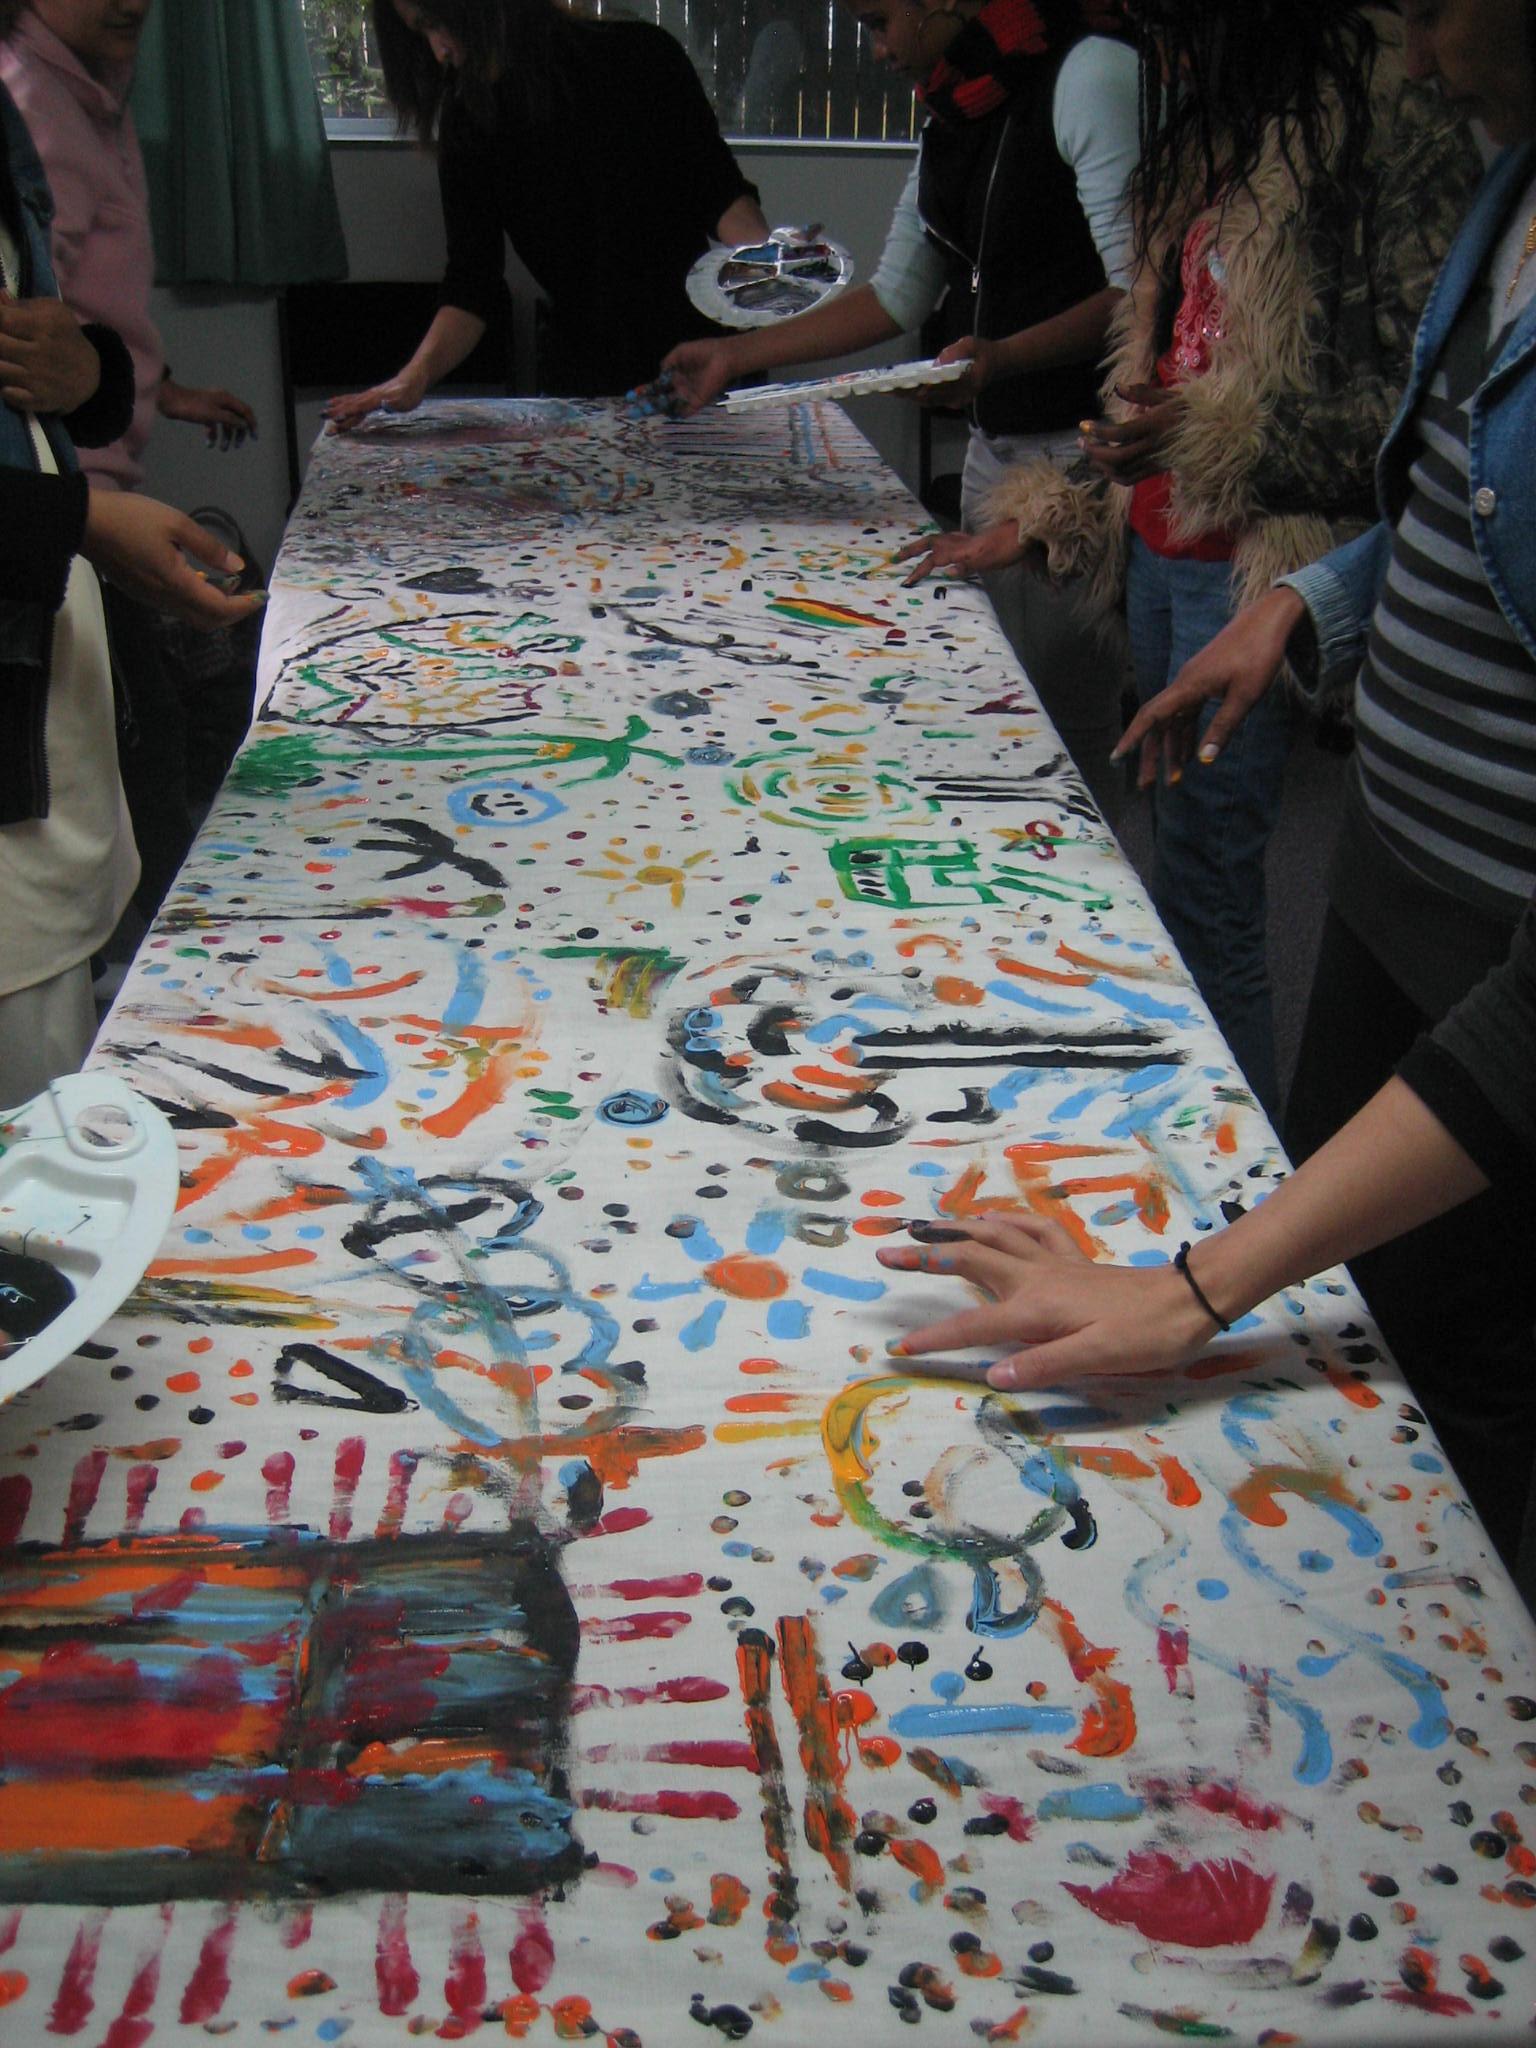 http://shakti-international.org/wp-content/uploads/2013/07/Art-Therapy-Setac1.jpg